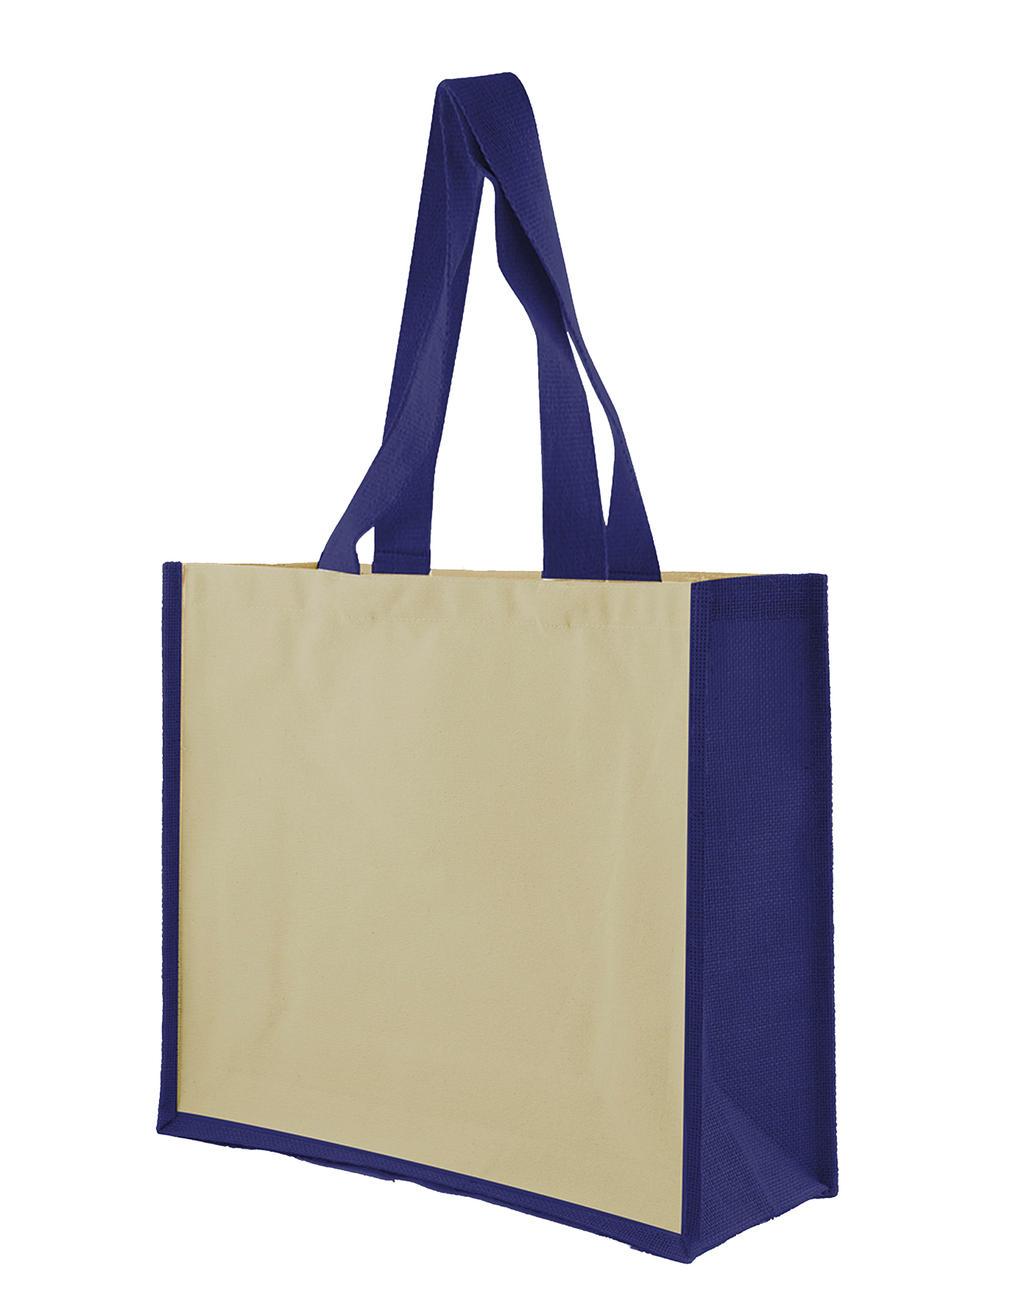 Jutton Leisure Bag